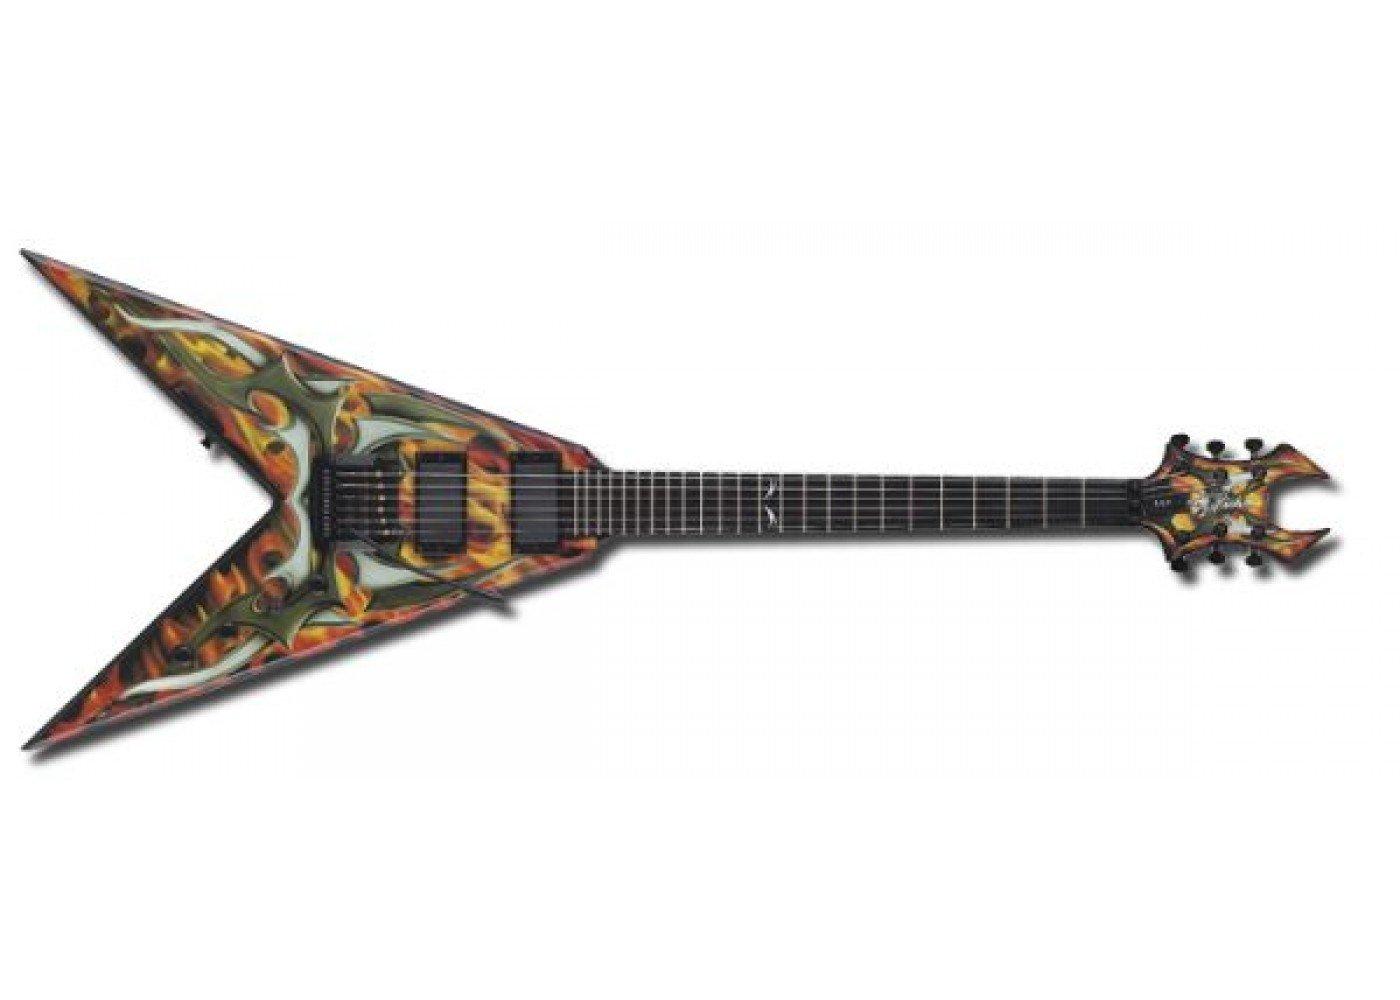 B.C. Rich Kerry King Signature Flying V Guitar